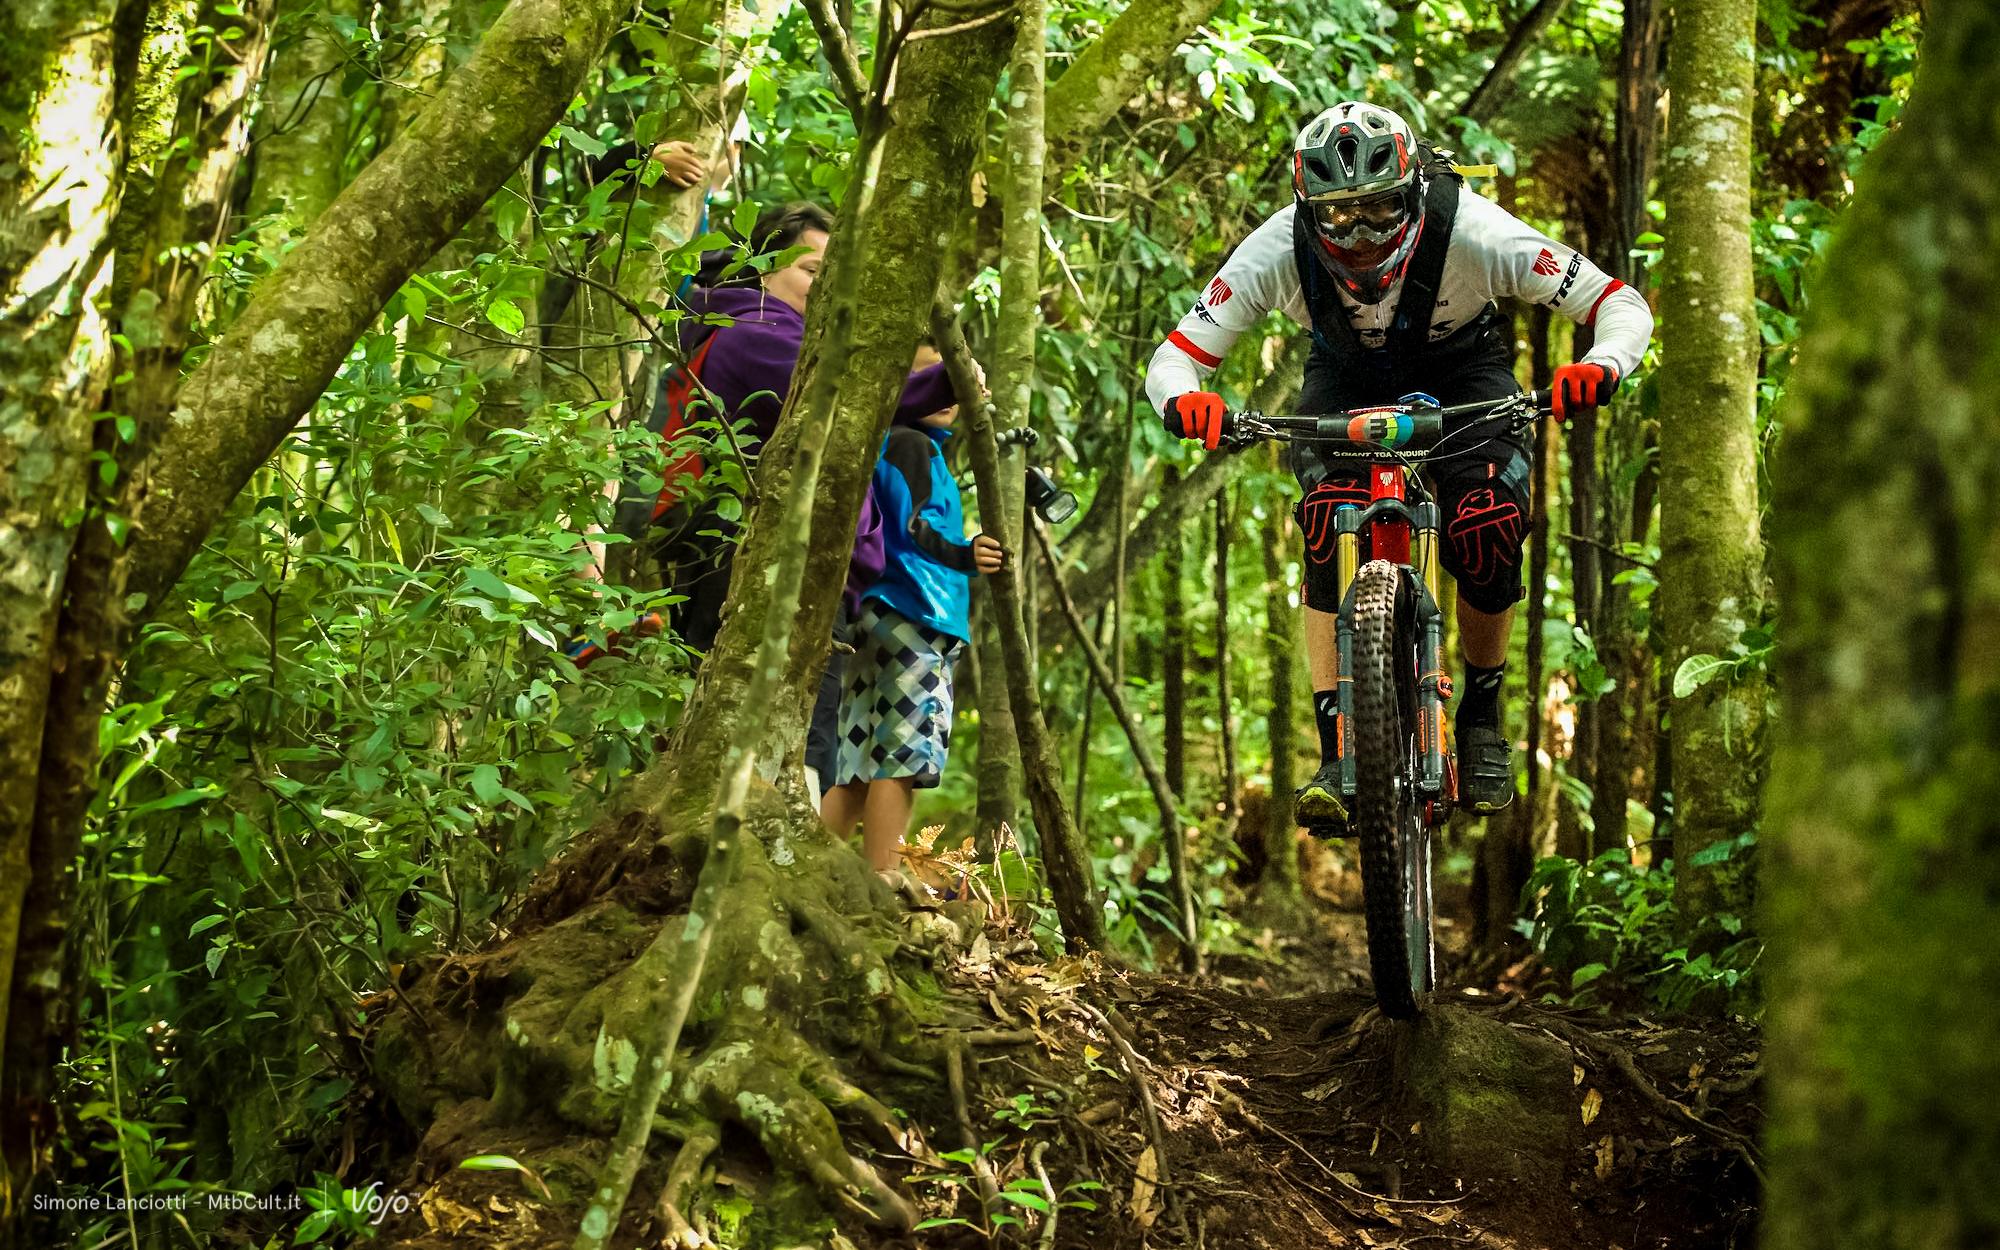 Enduro_World_Series_Rotorua_Copyright_Simone_Lanciotti_MTBCult_VojoMag-43